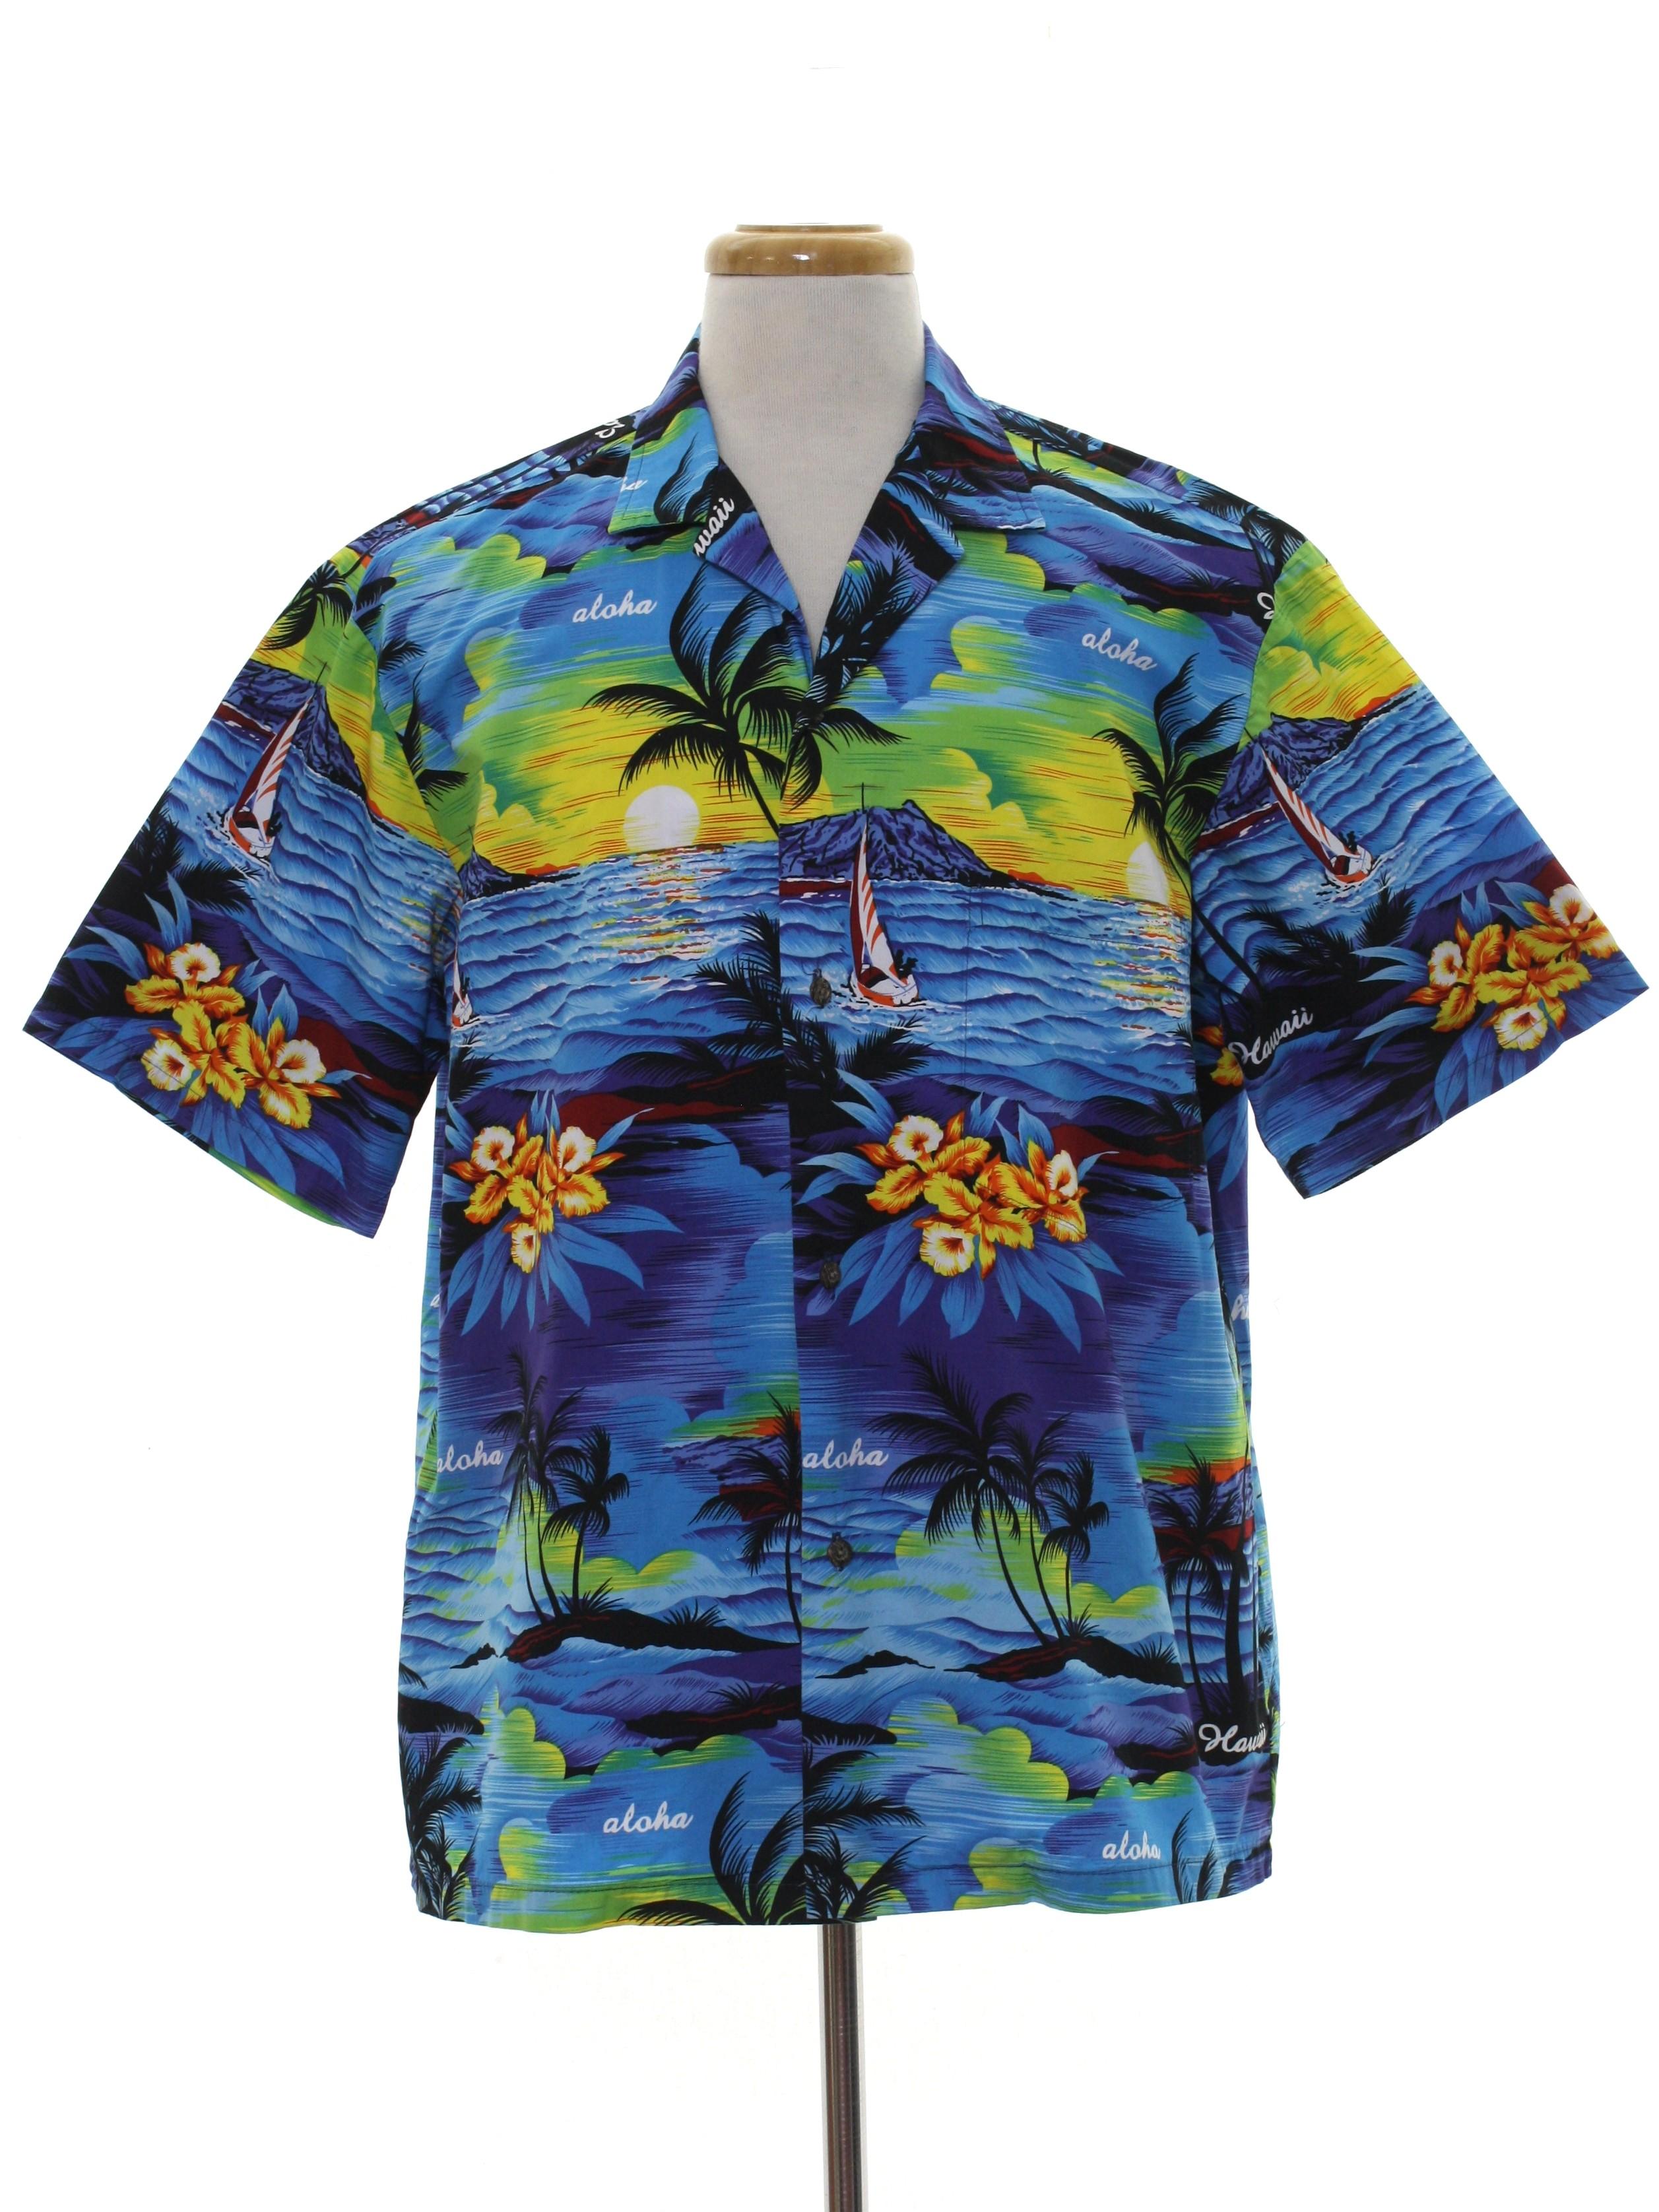 4ae8897a 80s Vintage Royal Creations Made in Hawaii Hawaiian Shirt: 80s ...